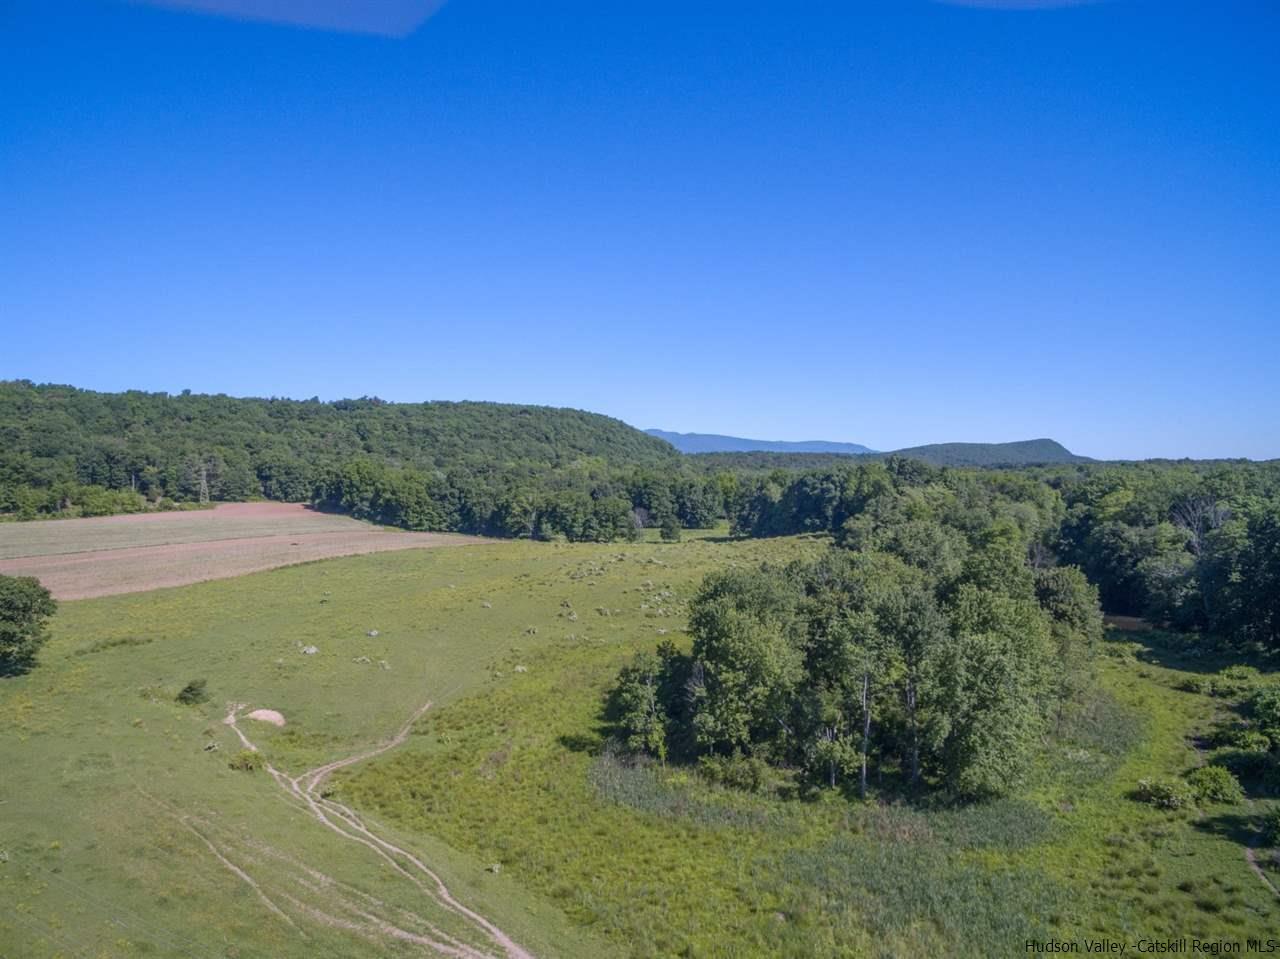 Additional photo for property listing at 40 SHEEHAN LANE 40 SHEEHAN LANE Lake Katrine, New York 12449 United States